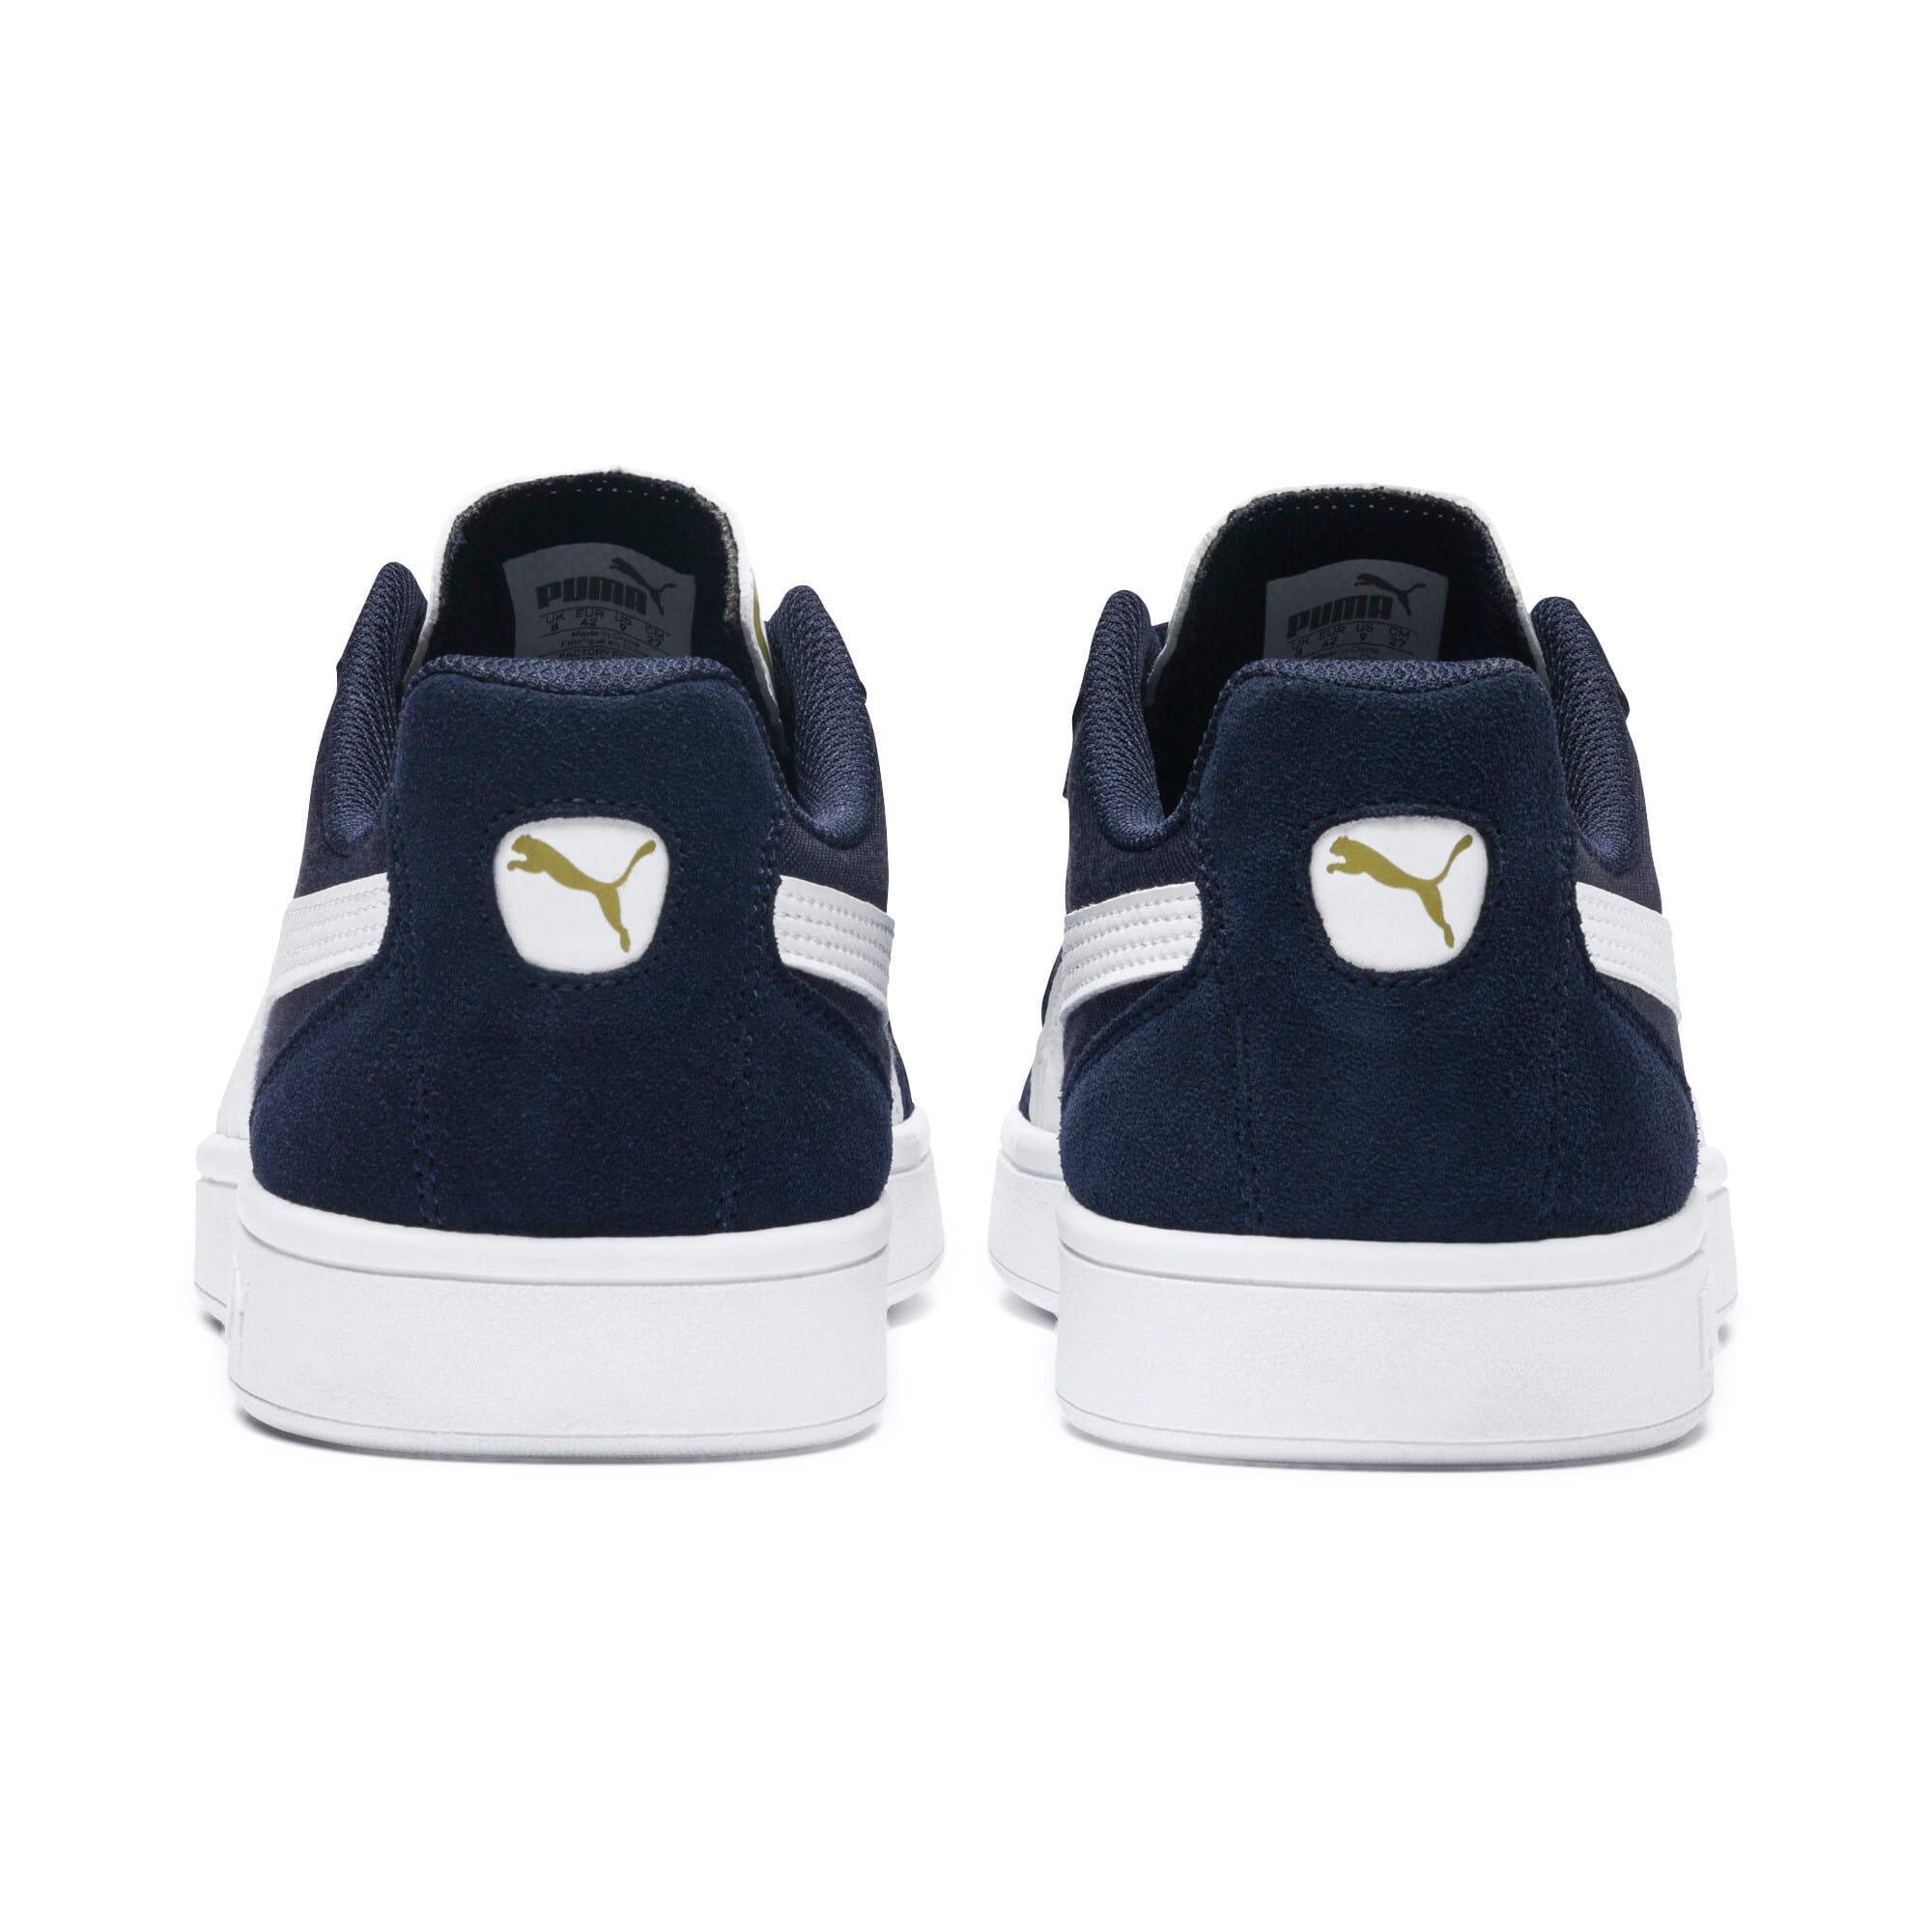 Miniatura 3 de Zapatos deportivos Astro Kick, Peacoat-Puma White, mediano